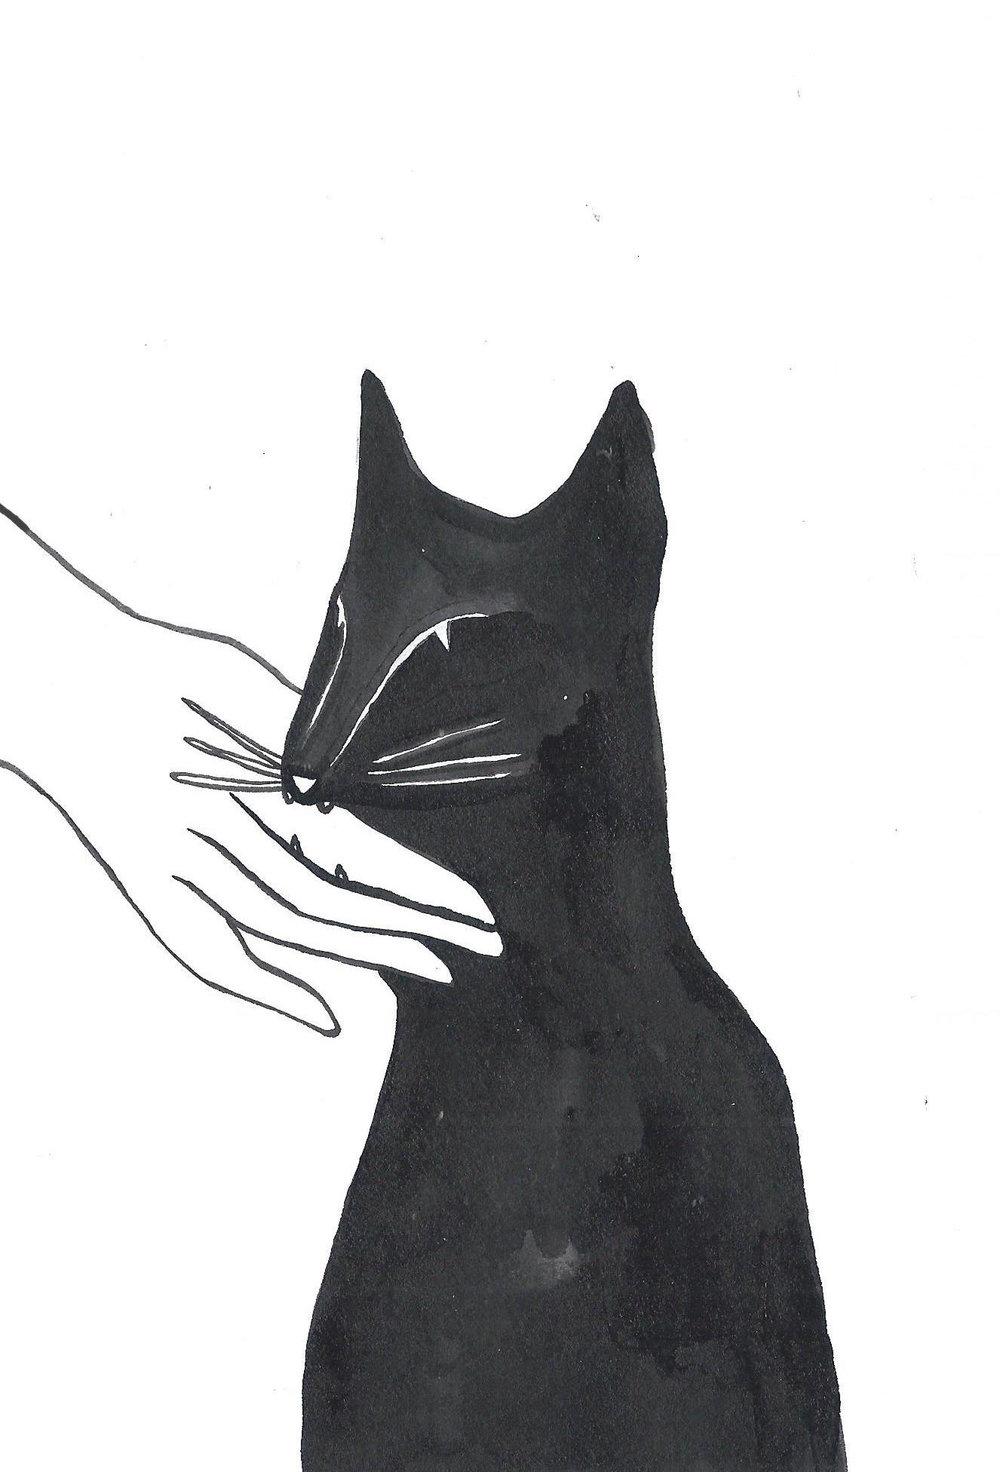 cat biting JPEG.jpg